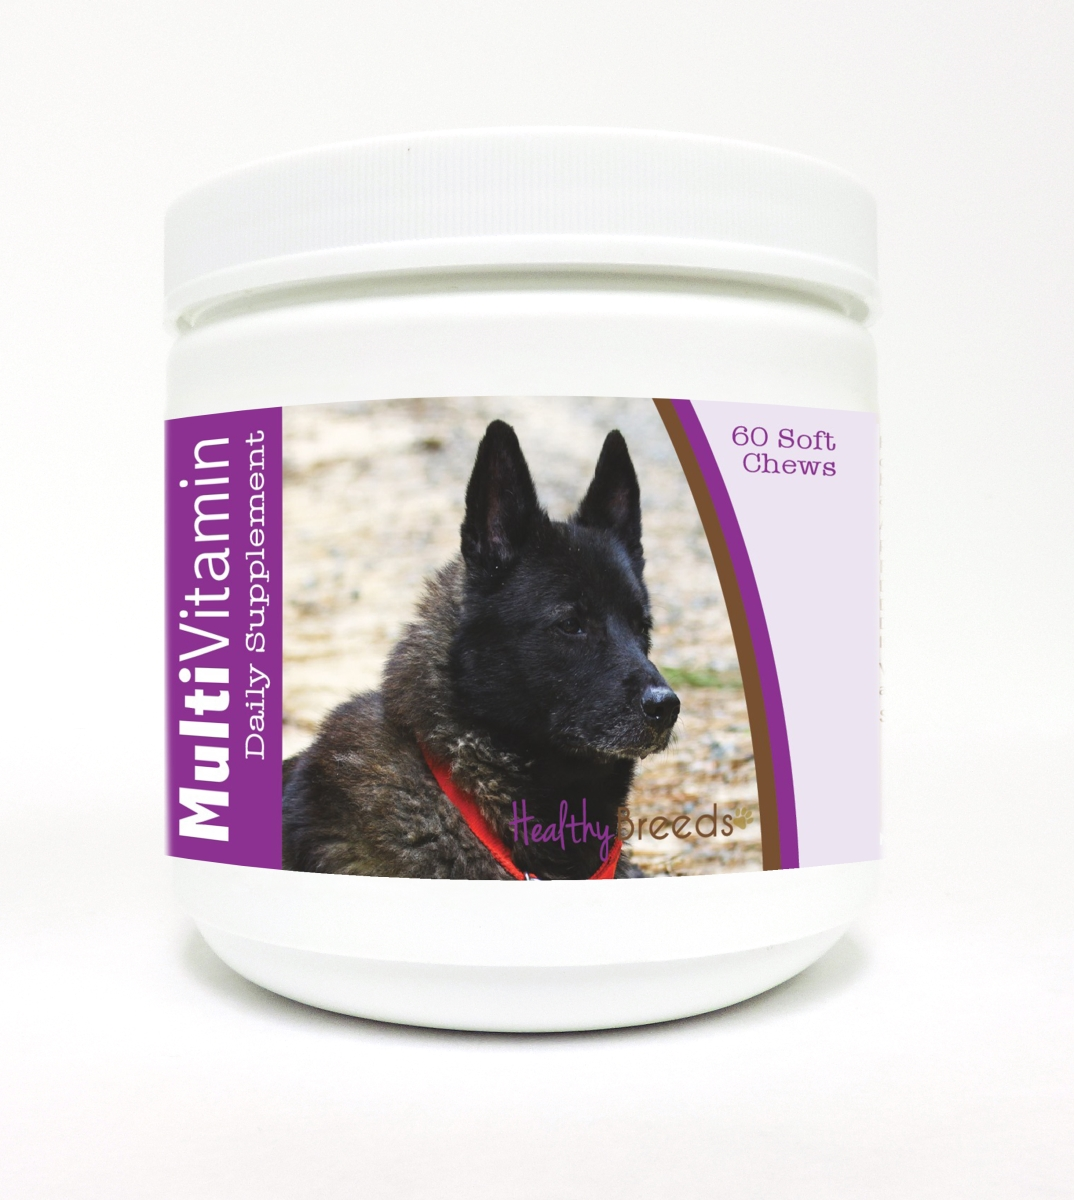 Healthy Breeds 840235111566 Norwegian Elkhound Multi-Vitamin Soft Chews - 60 Count